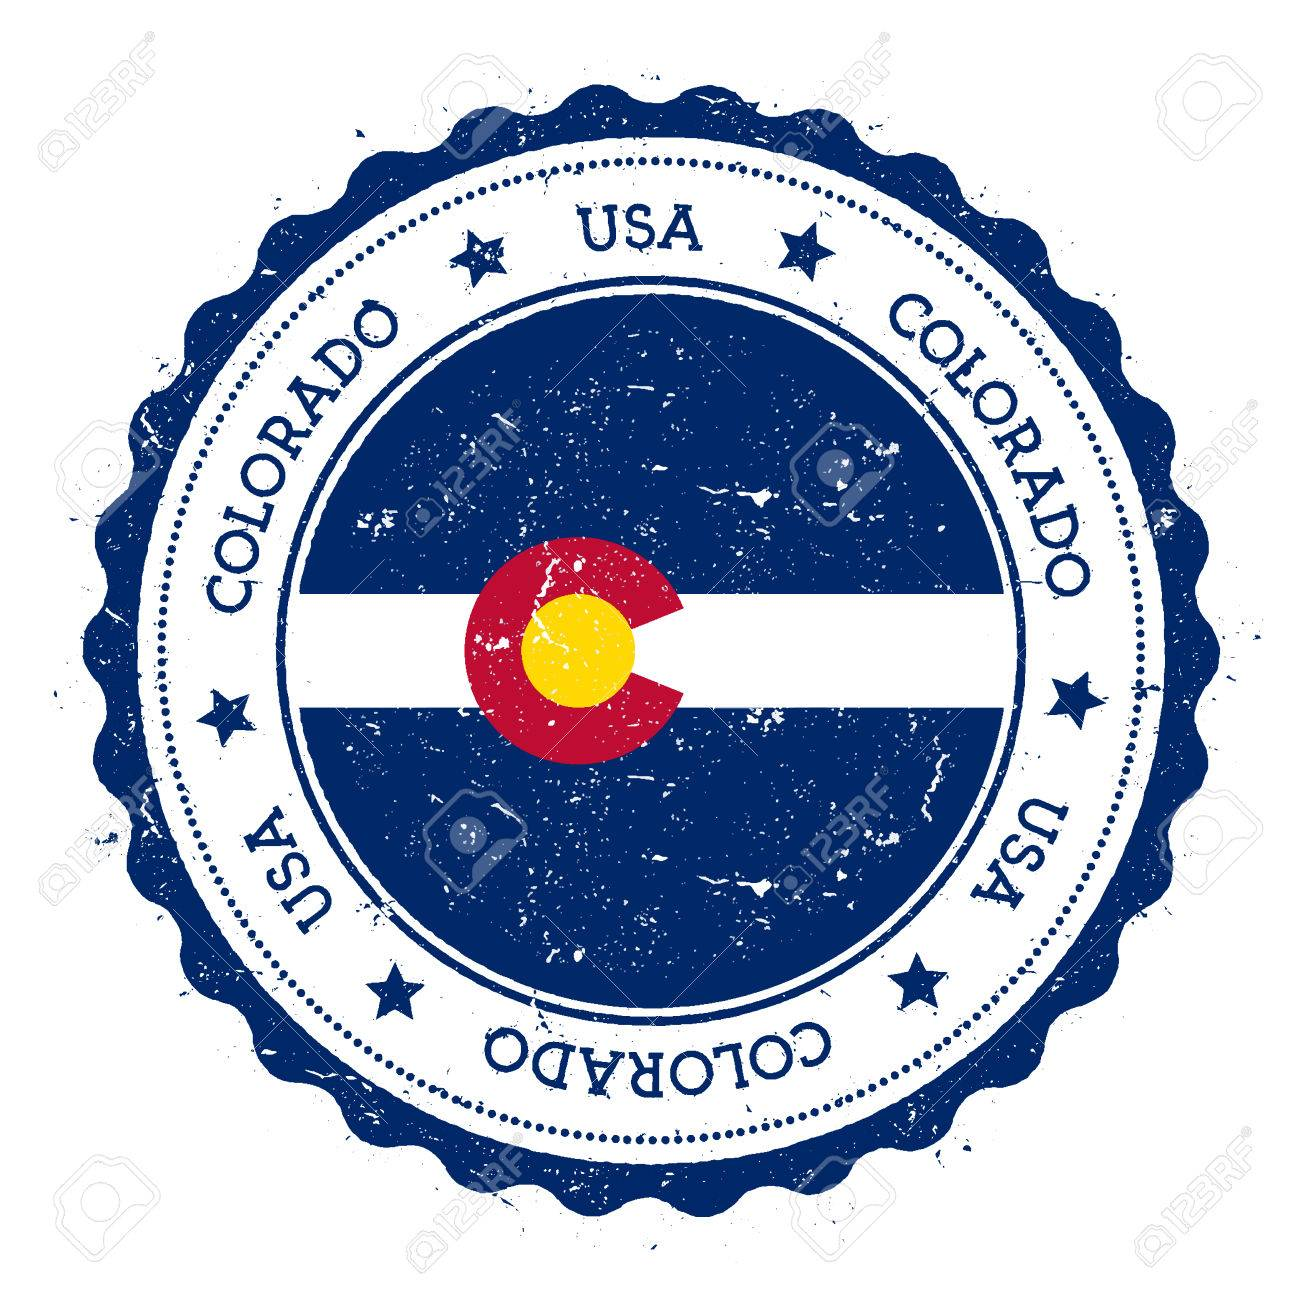 Colorado Flag Badge Grunge Rubber Stamp With Vintage Travel Circular